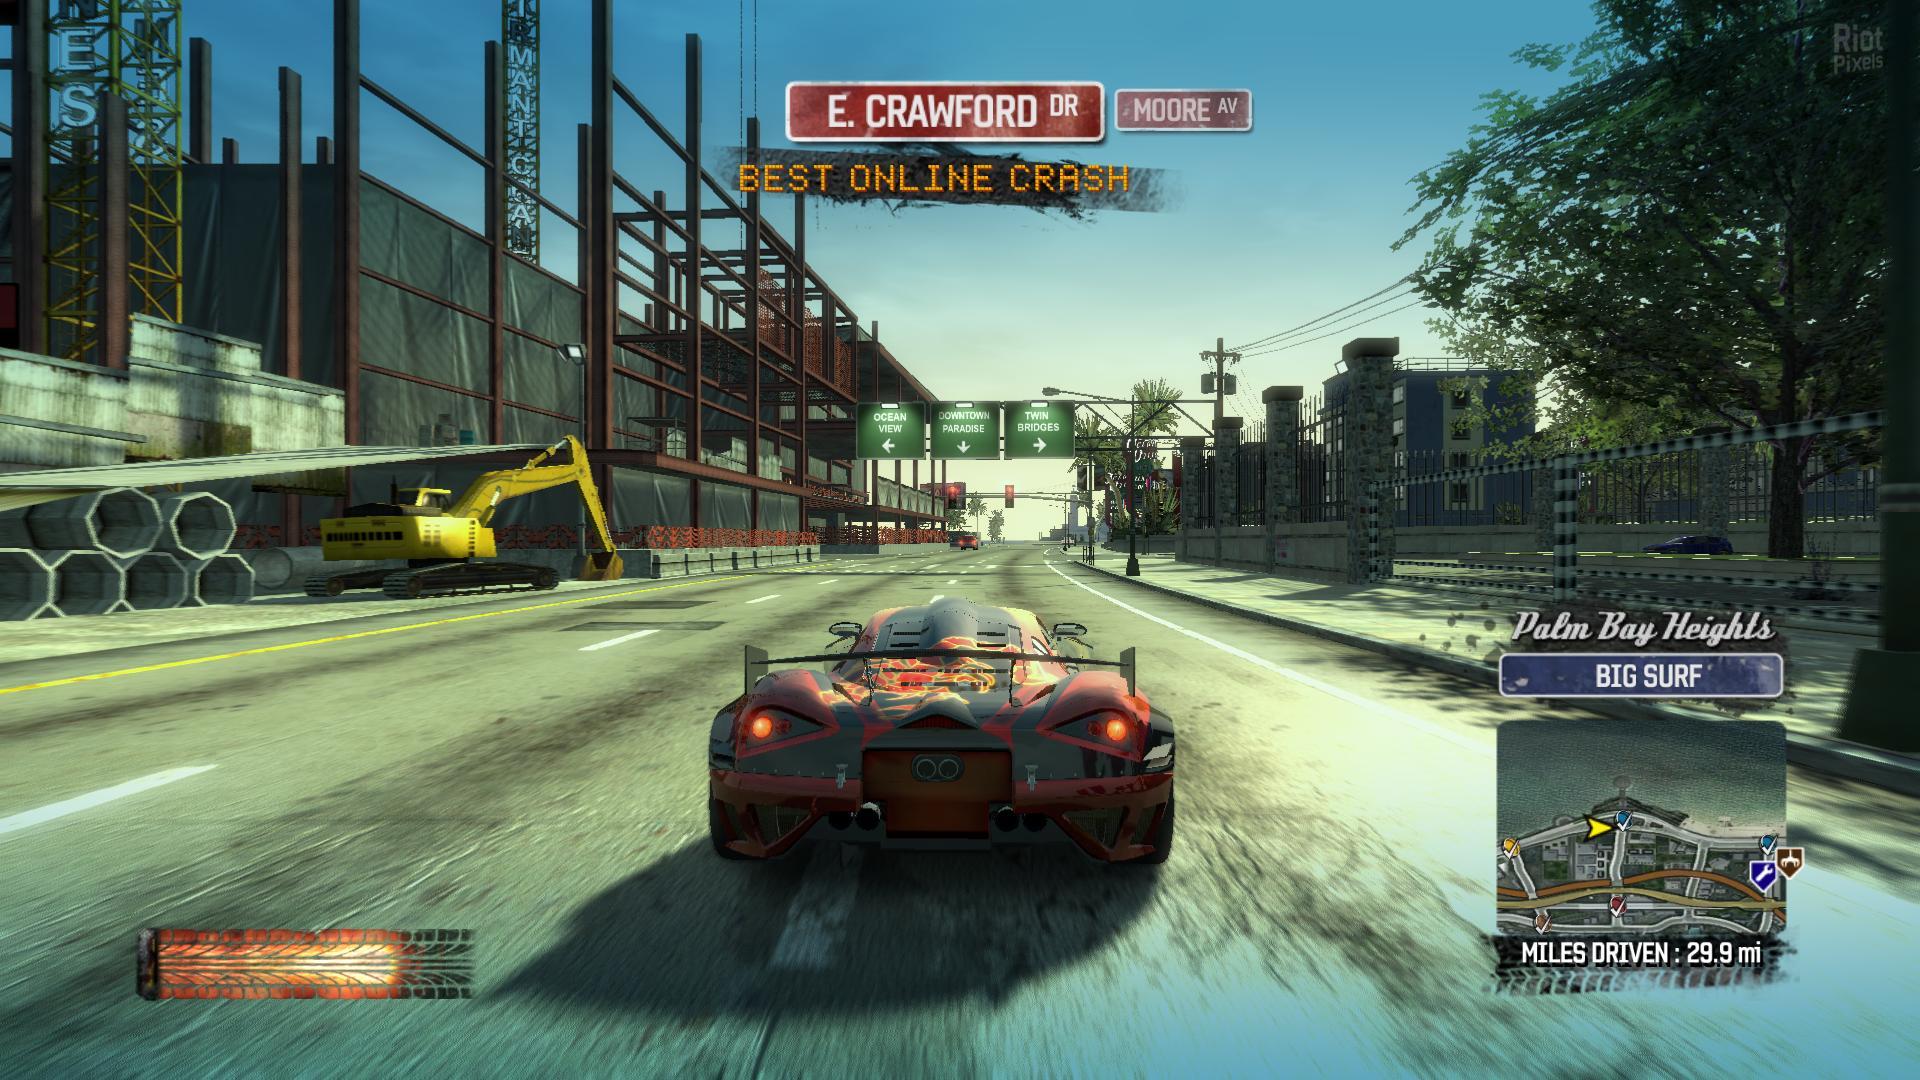 Burnout Paradise - game screenshots at Riot Pixels, images